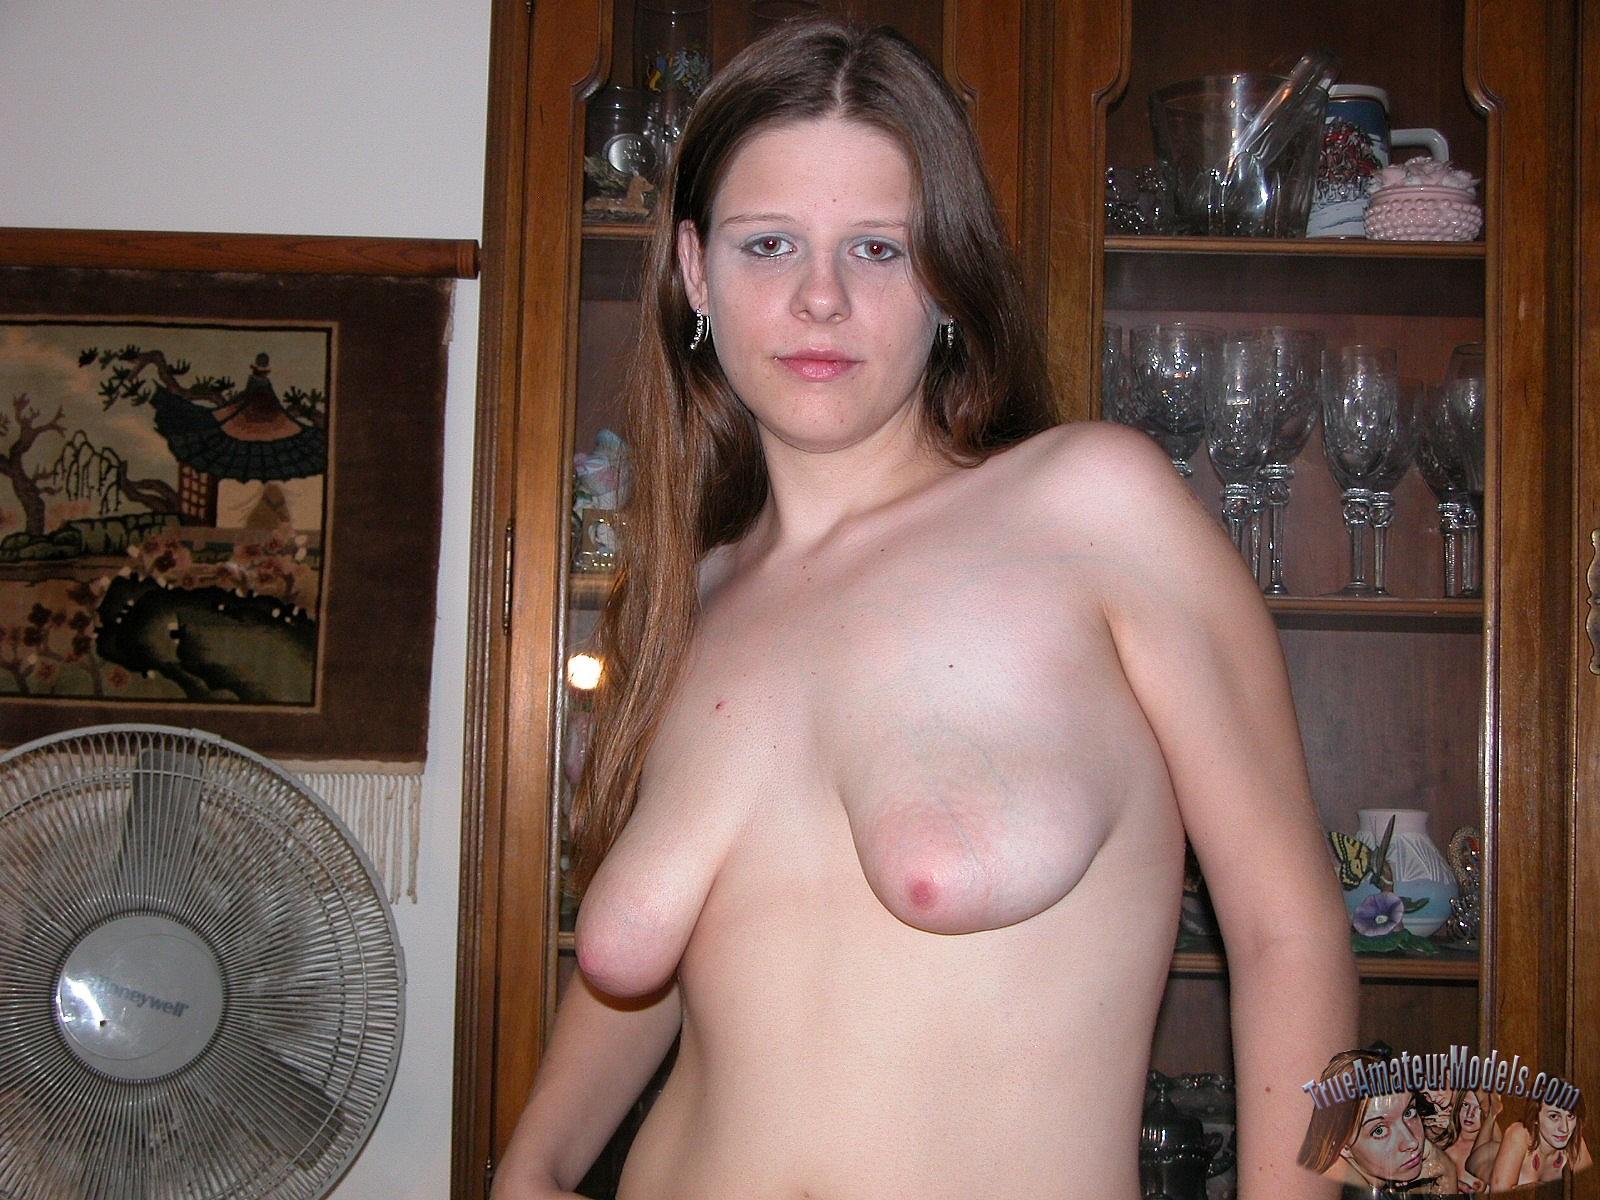 image Petite tall amateur czech girl public porn